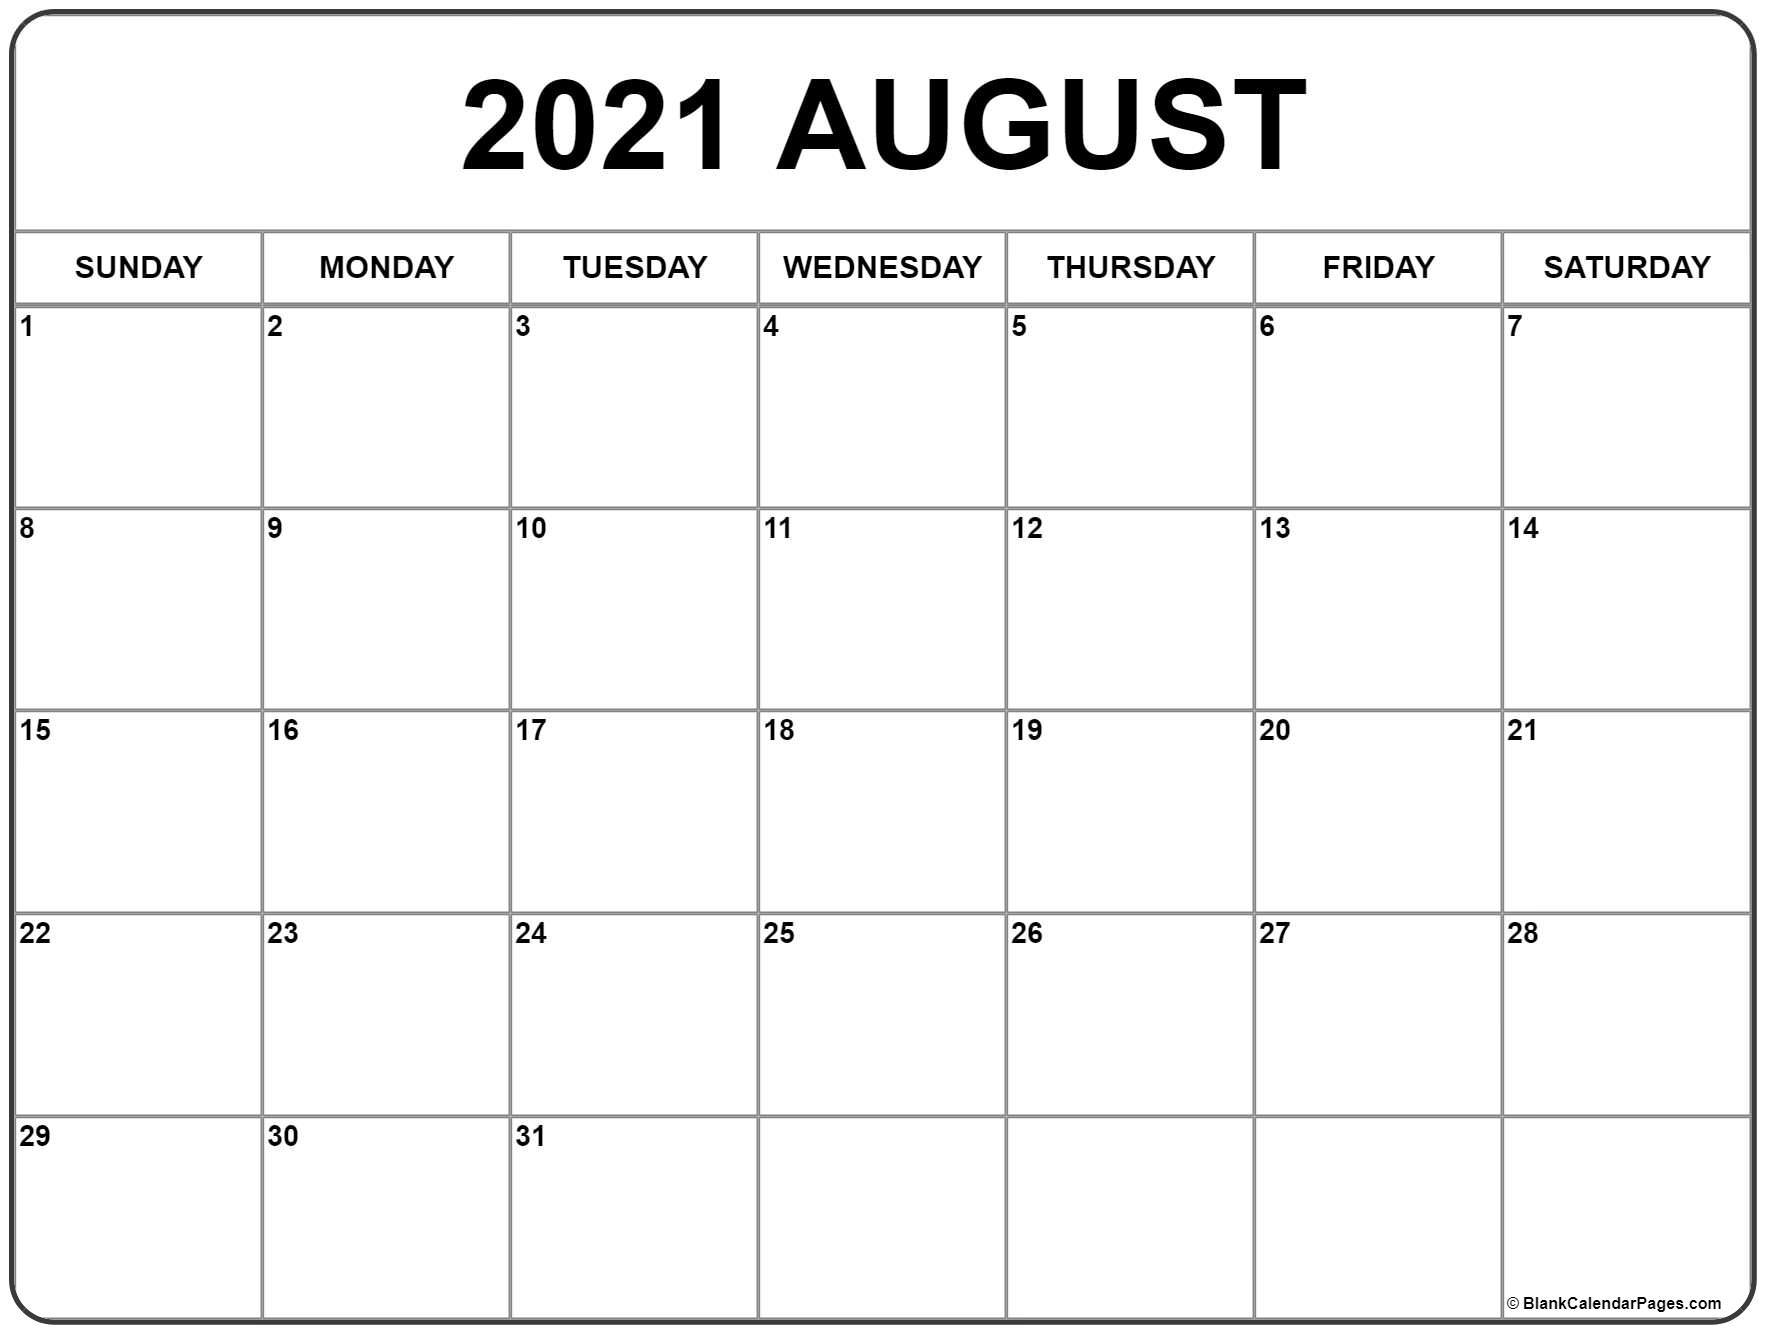 Take Printable Canlendar Aguastu Through December 2021